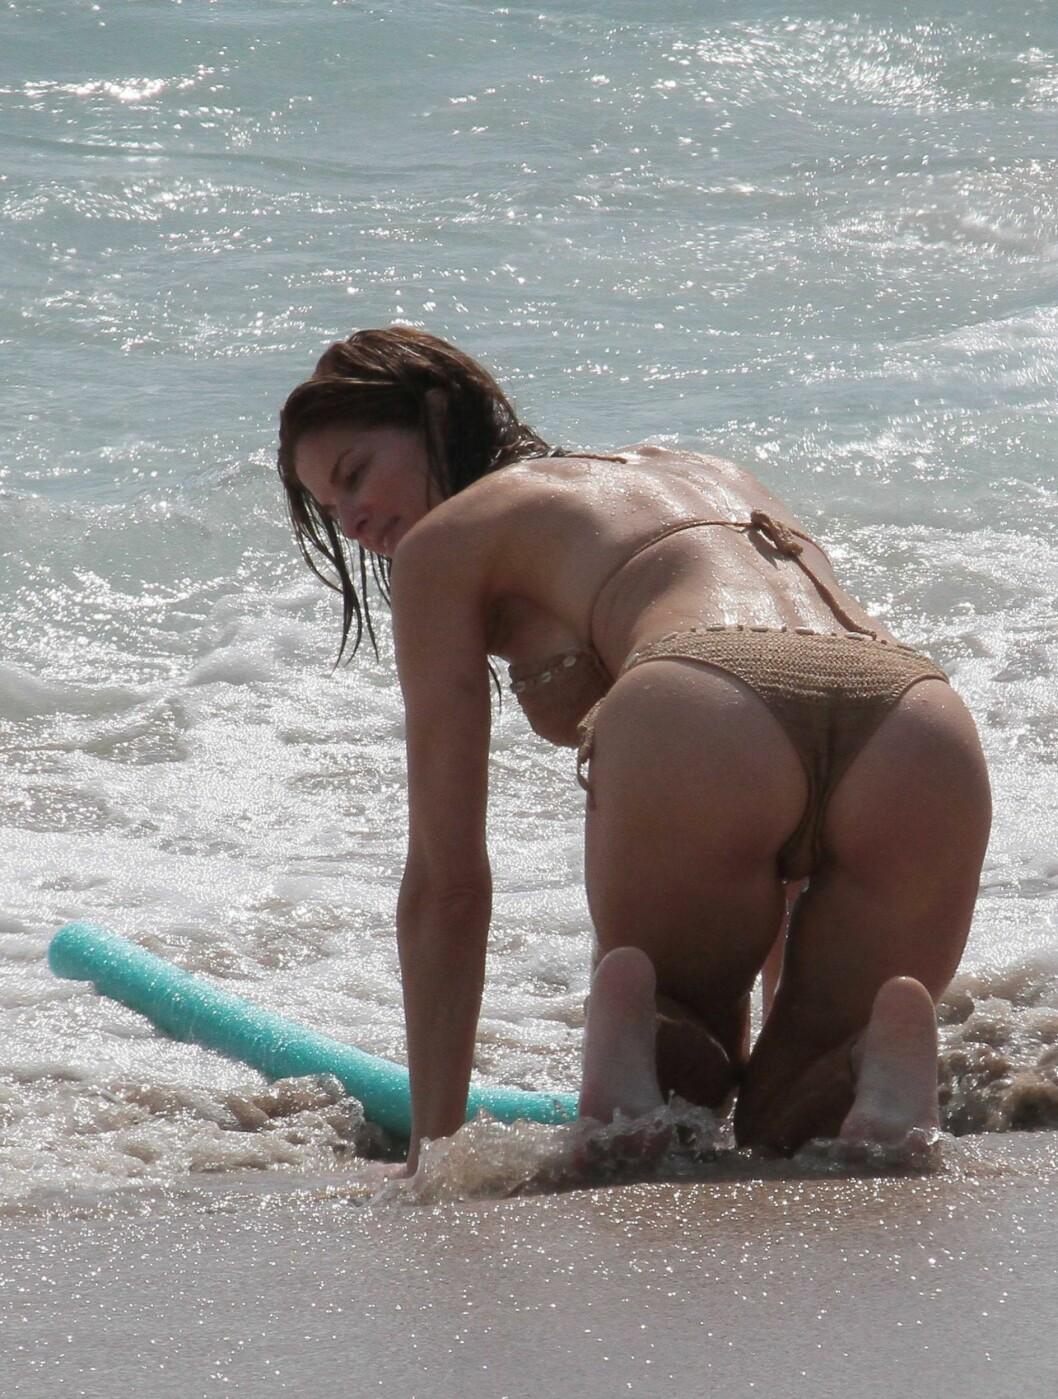 BURDE VÆRT ULOVLIG?: Radar Online mener denne bikinien nesten burde vært ulovlig. Foto: STELLA PICTURES